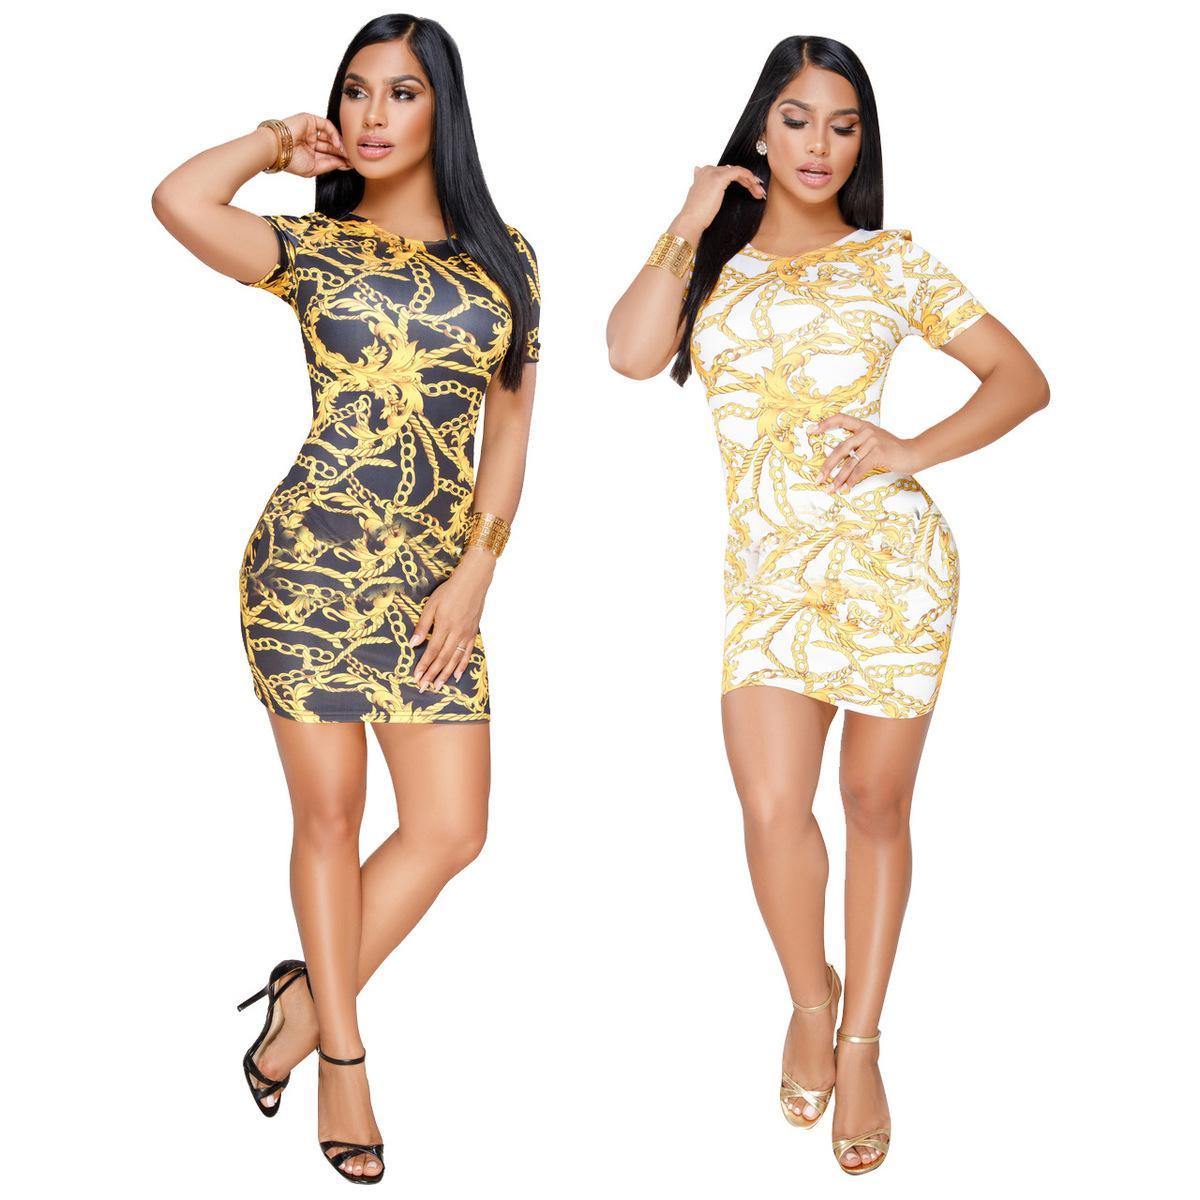 2018 Second Horse Sun Standard Code Sexy Heat Fashion Suit Dress ...